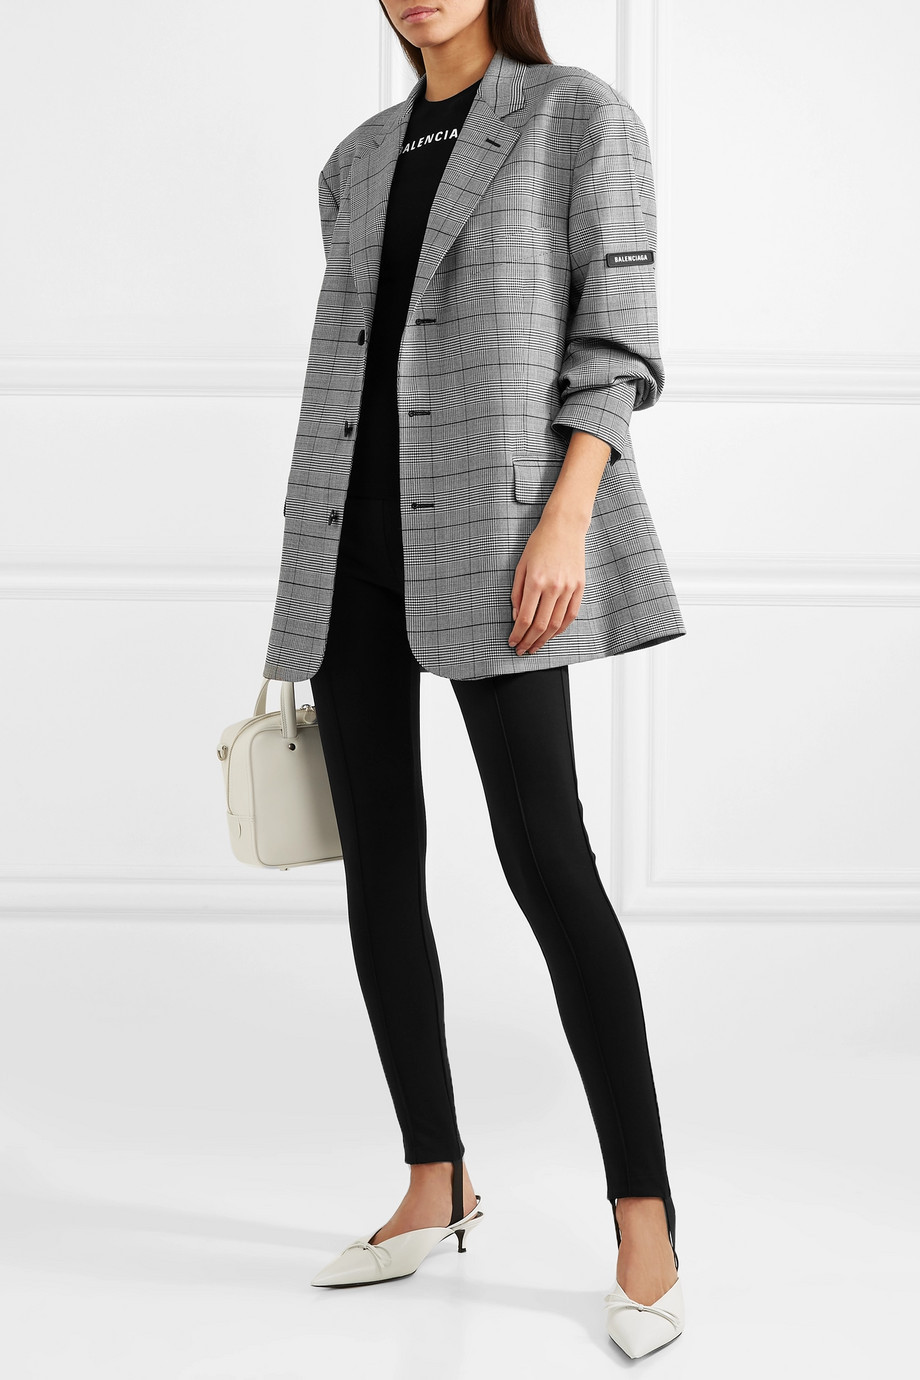 Balenciaga Prince of Wales checked cady blazer with internal shoulder pads $2,650